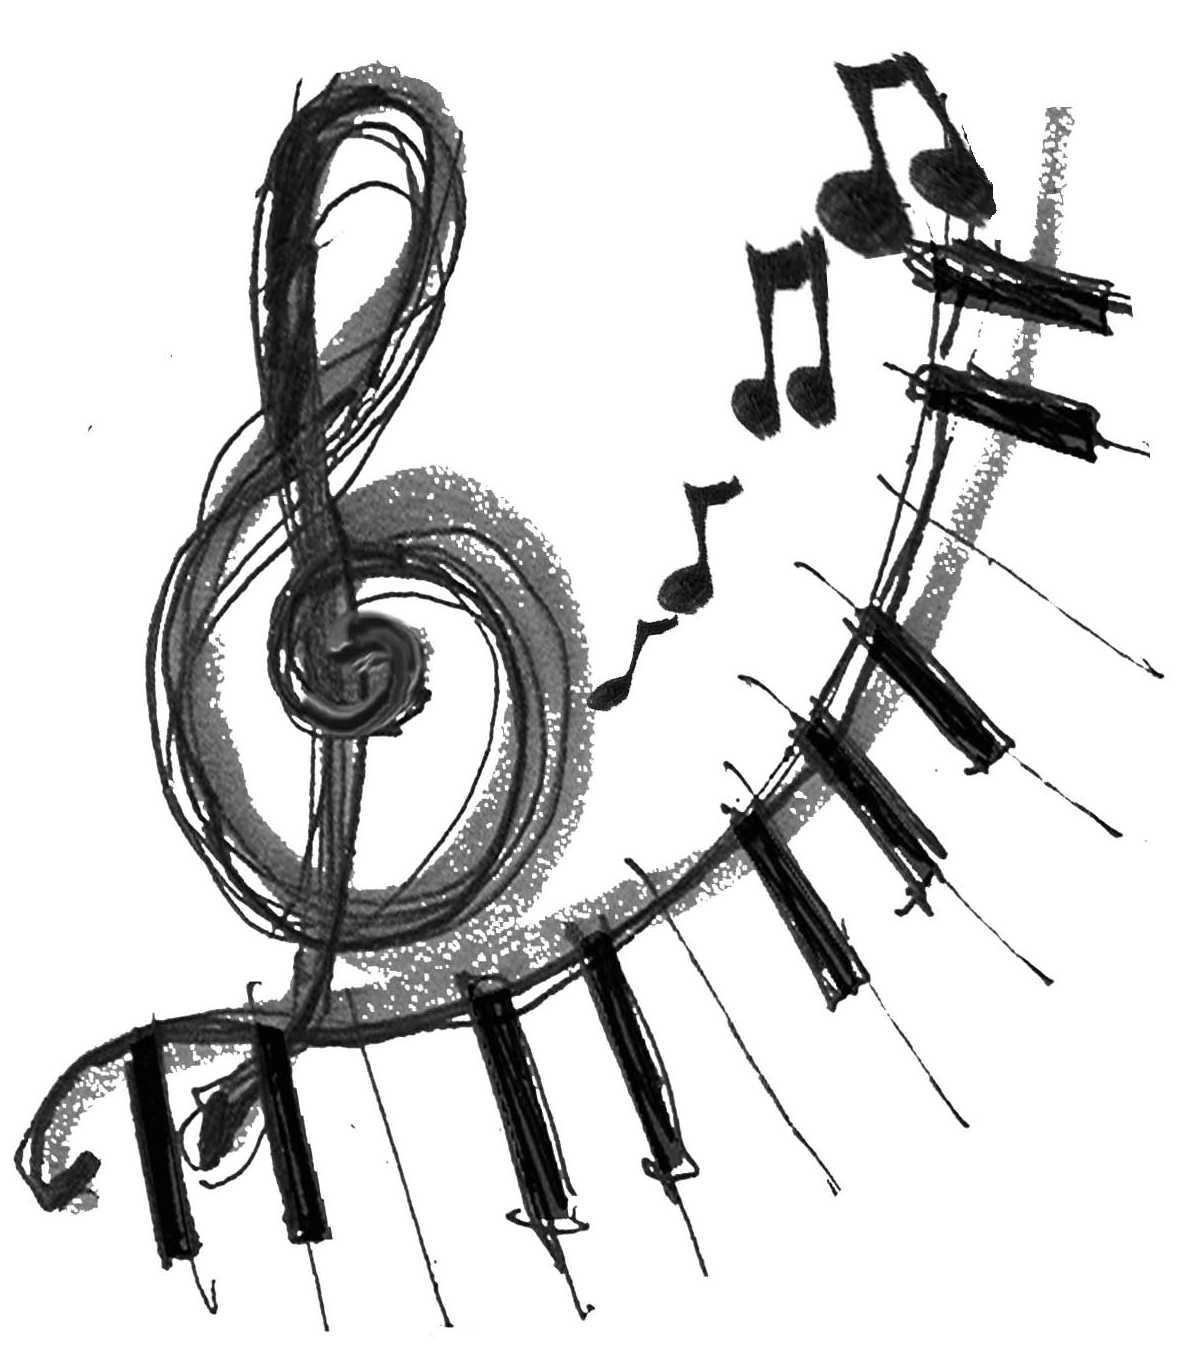 http://4.bp.blogspot.com/-TBYL4dt2Jao/UMsY-AccMGI/AAAAAAAAAS8/BVeqntgCcOA/s1600/music.jpg